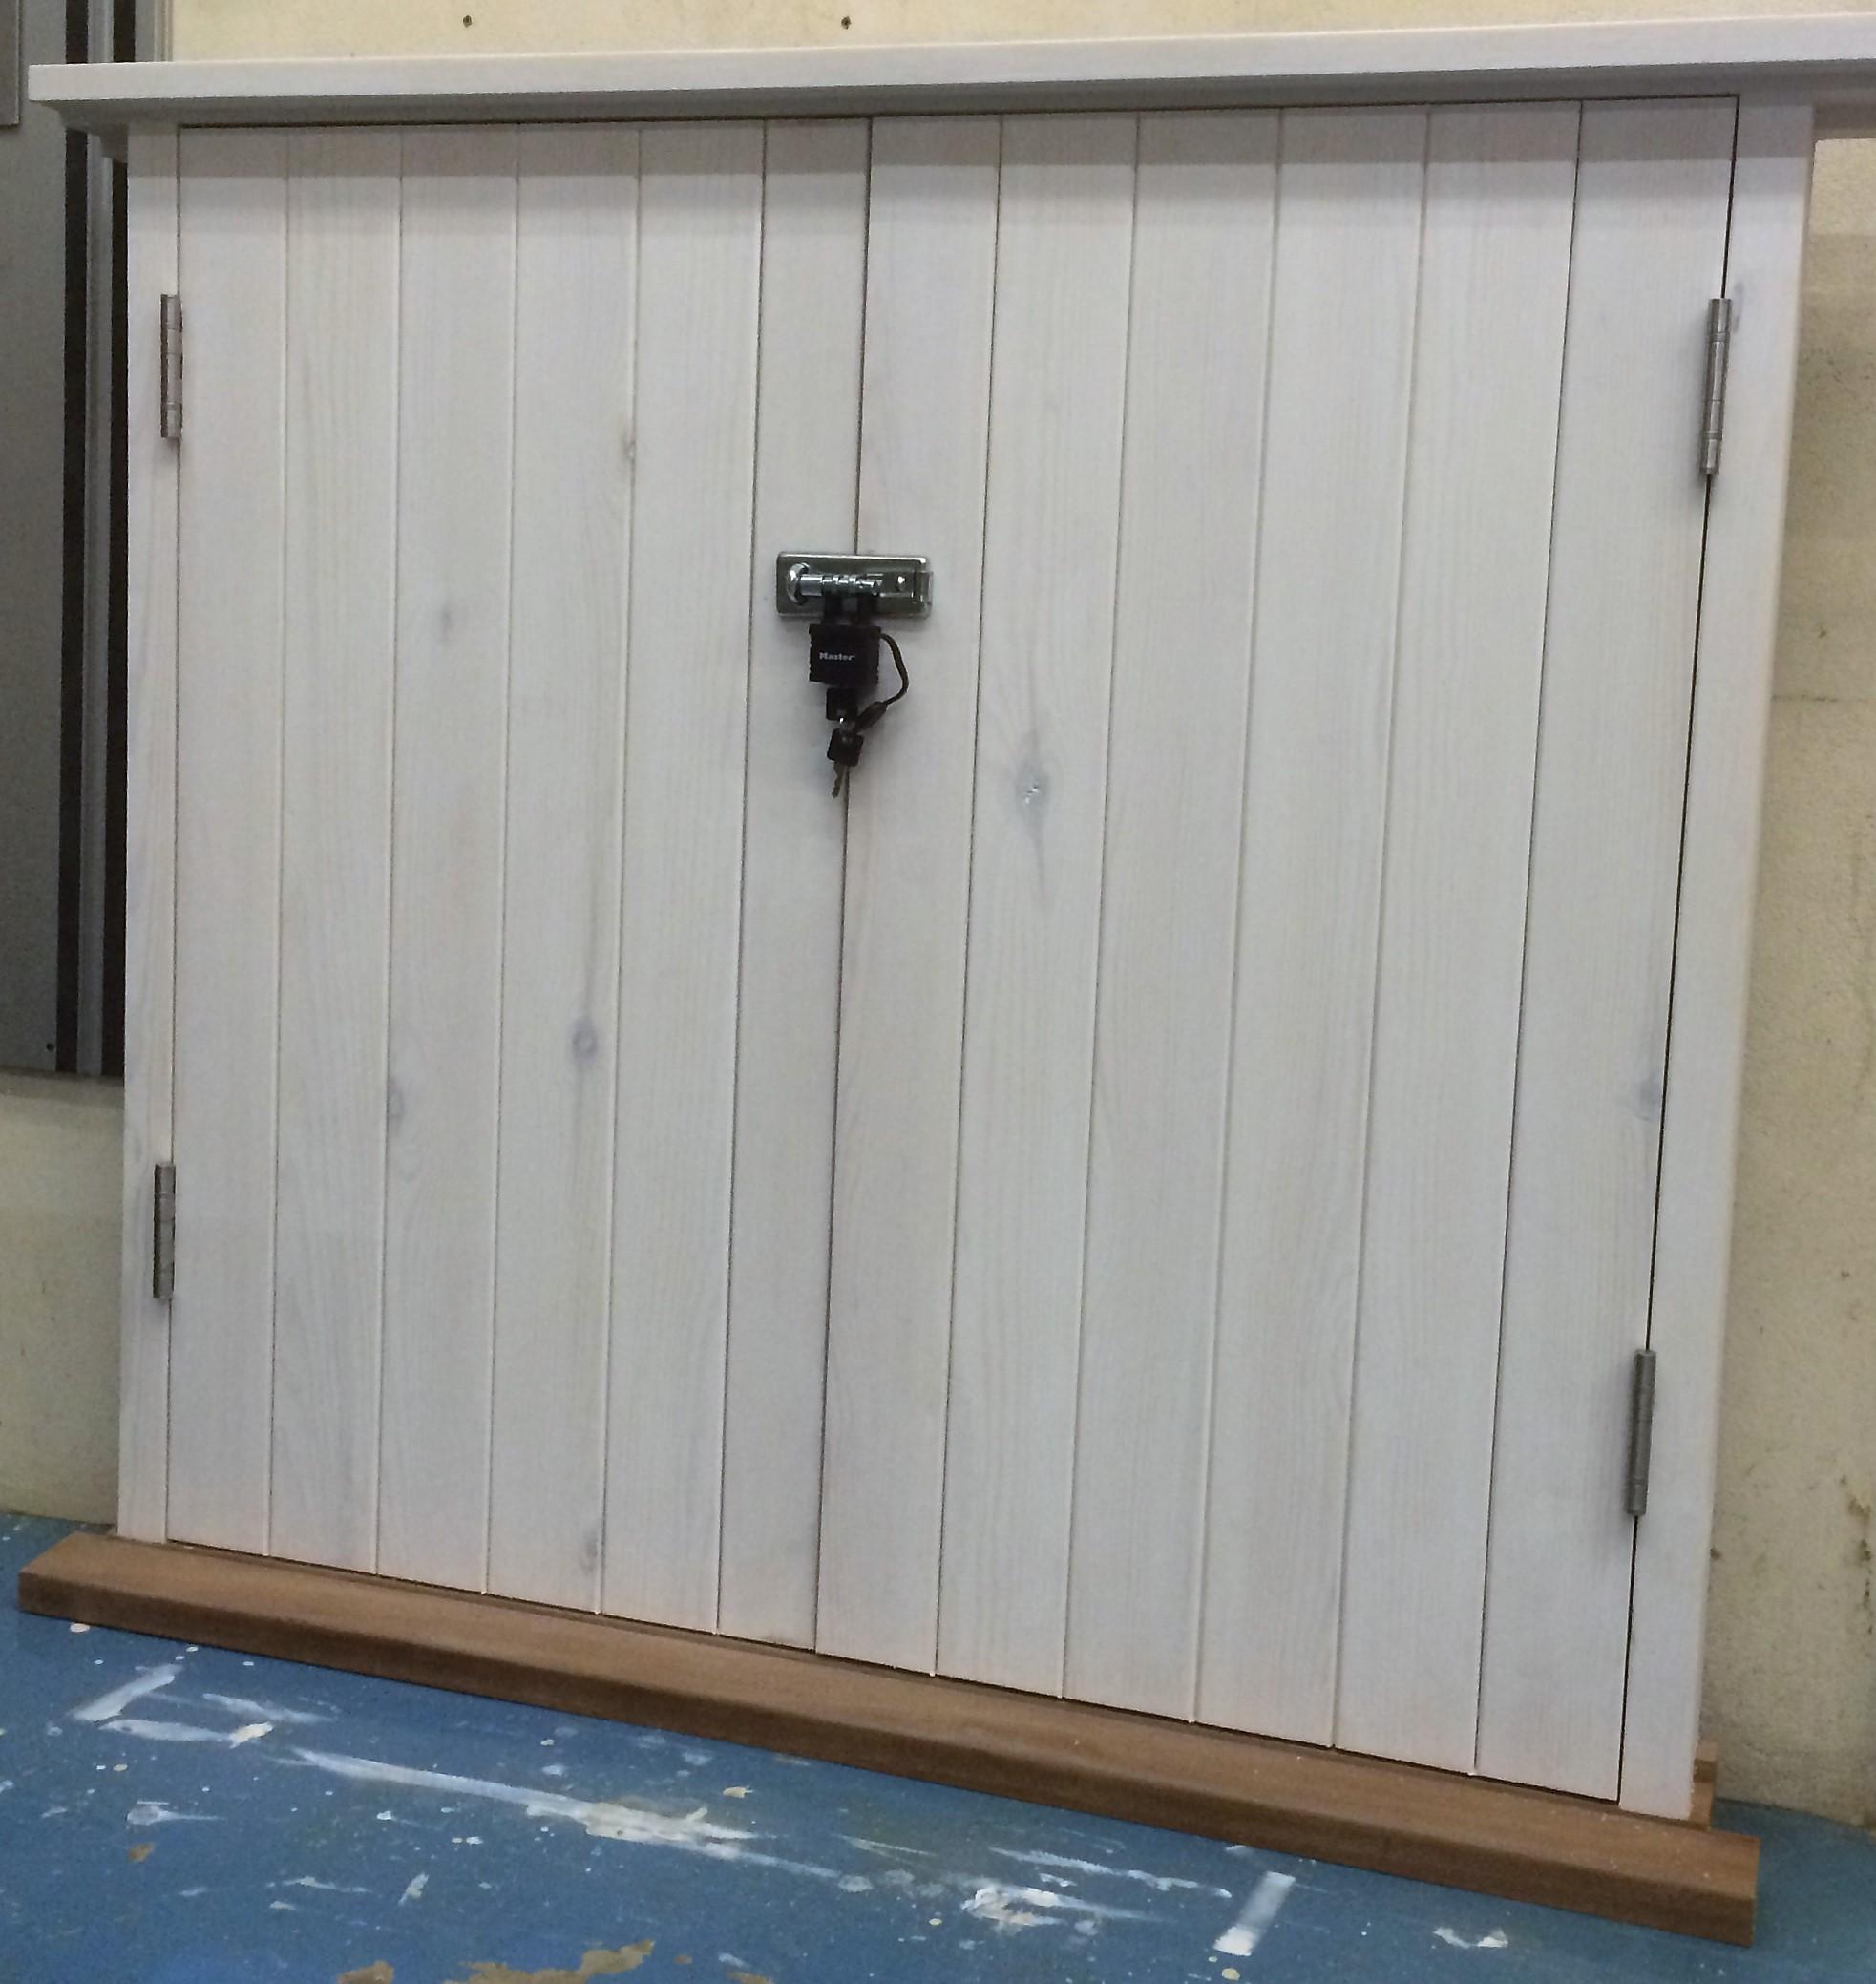 Surprising External Wooden Doors Howdens Gallery Exterior Howdens Patio Doors & Howdens Patio Doors Internal External Doors Bifold Doors Magnet Trade